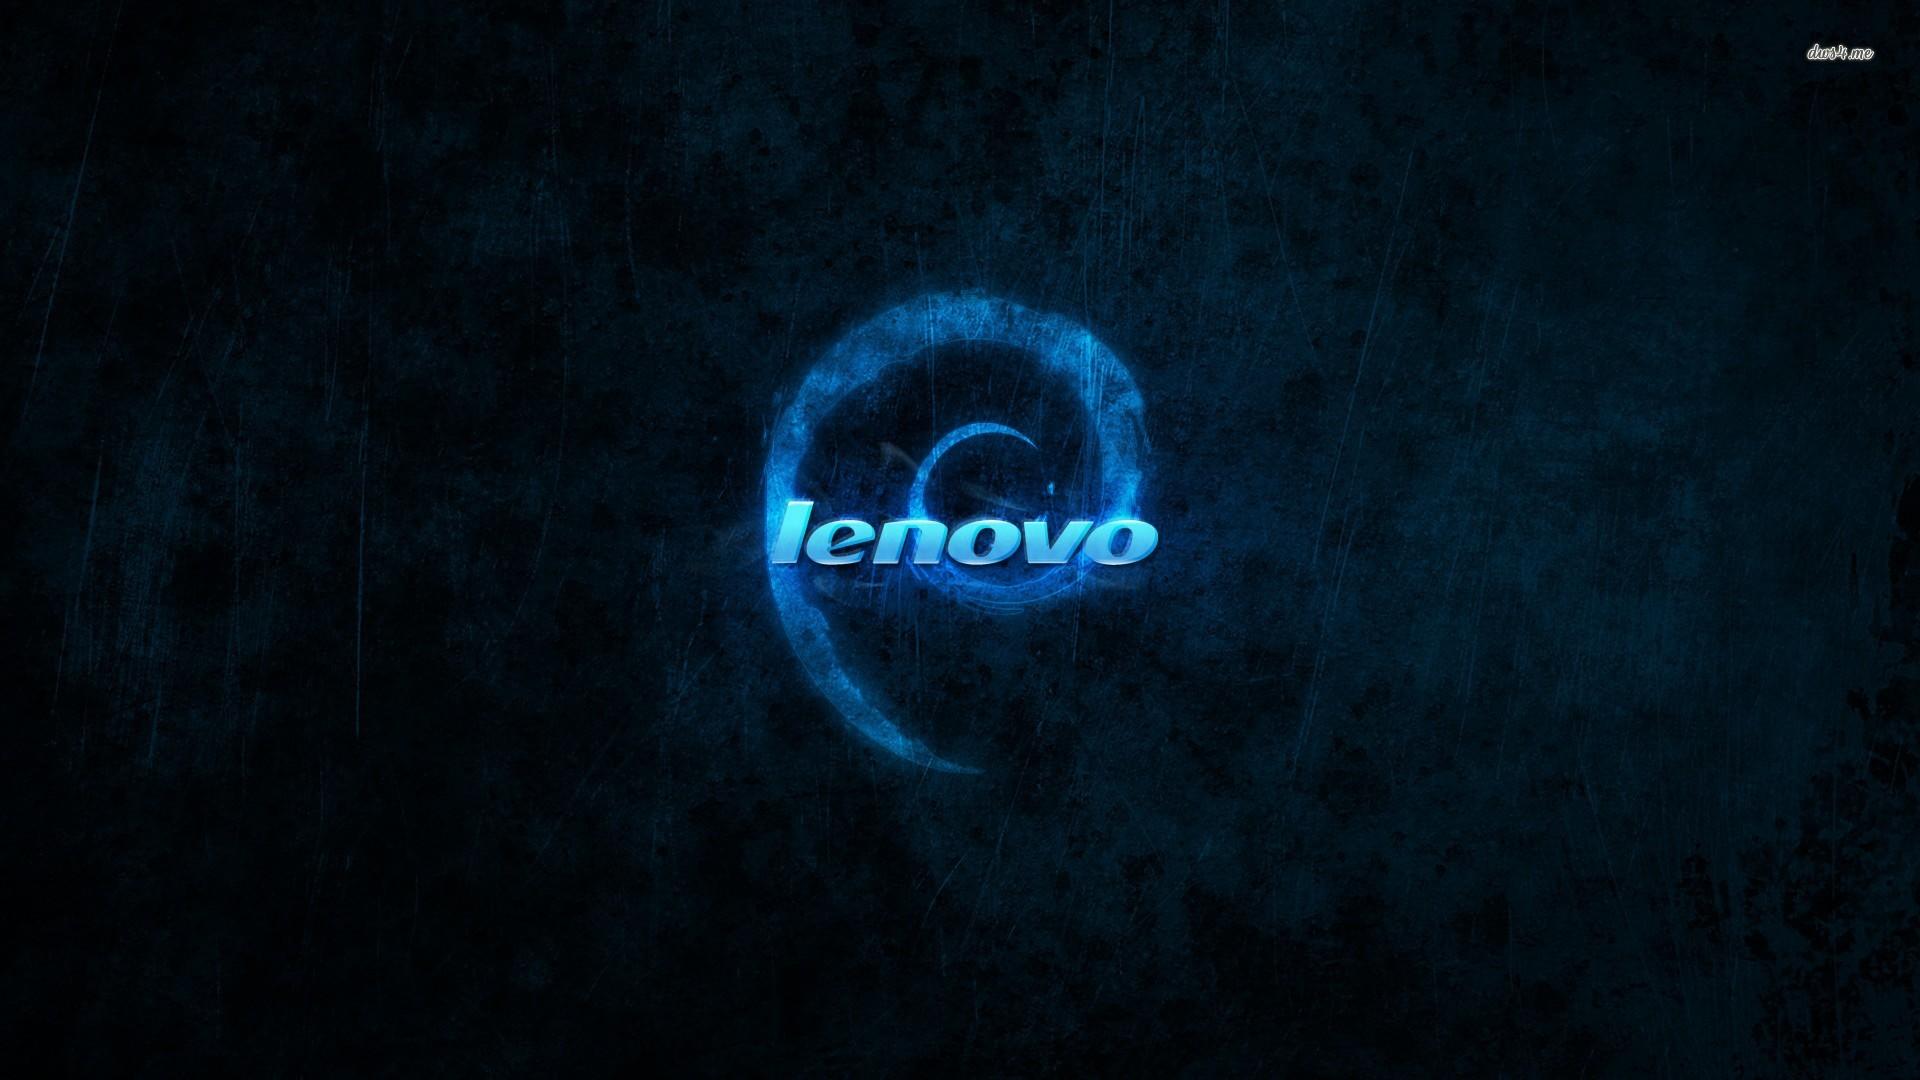 Lenovo wallpaper   1025785 1920x1080